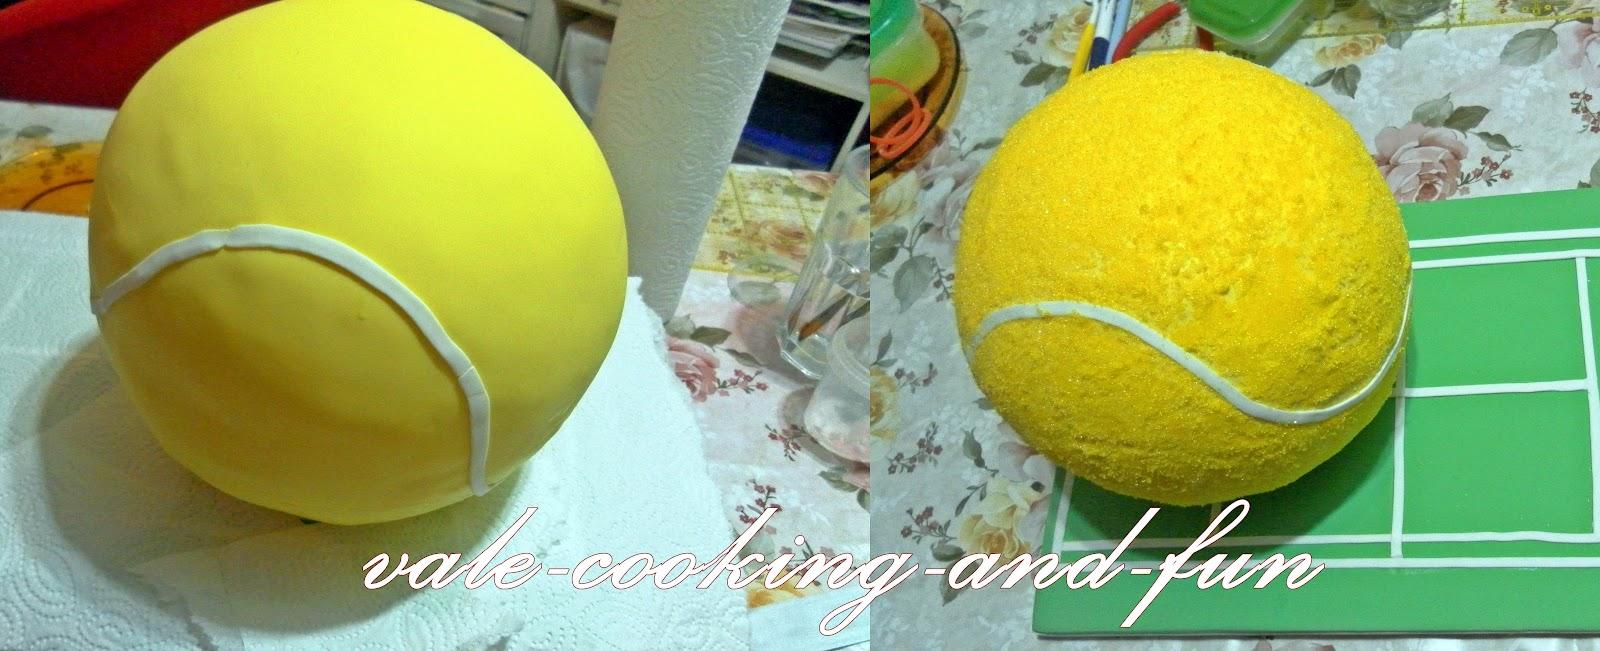 Küchengitter Ikea ~ besten cooking marmorkuchen als tennisball torte  u0440 u0430   u0440 u0435 u043d u0435 u0430   u043f u0430  u0430 u0435 u043d